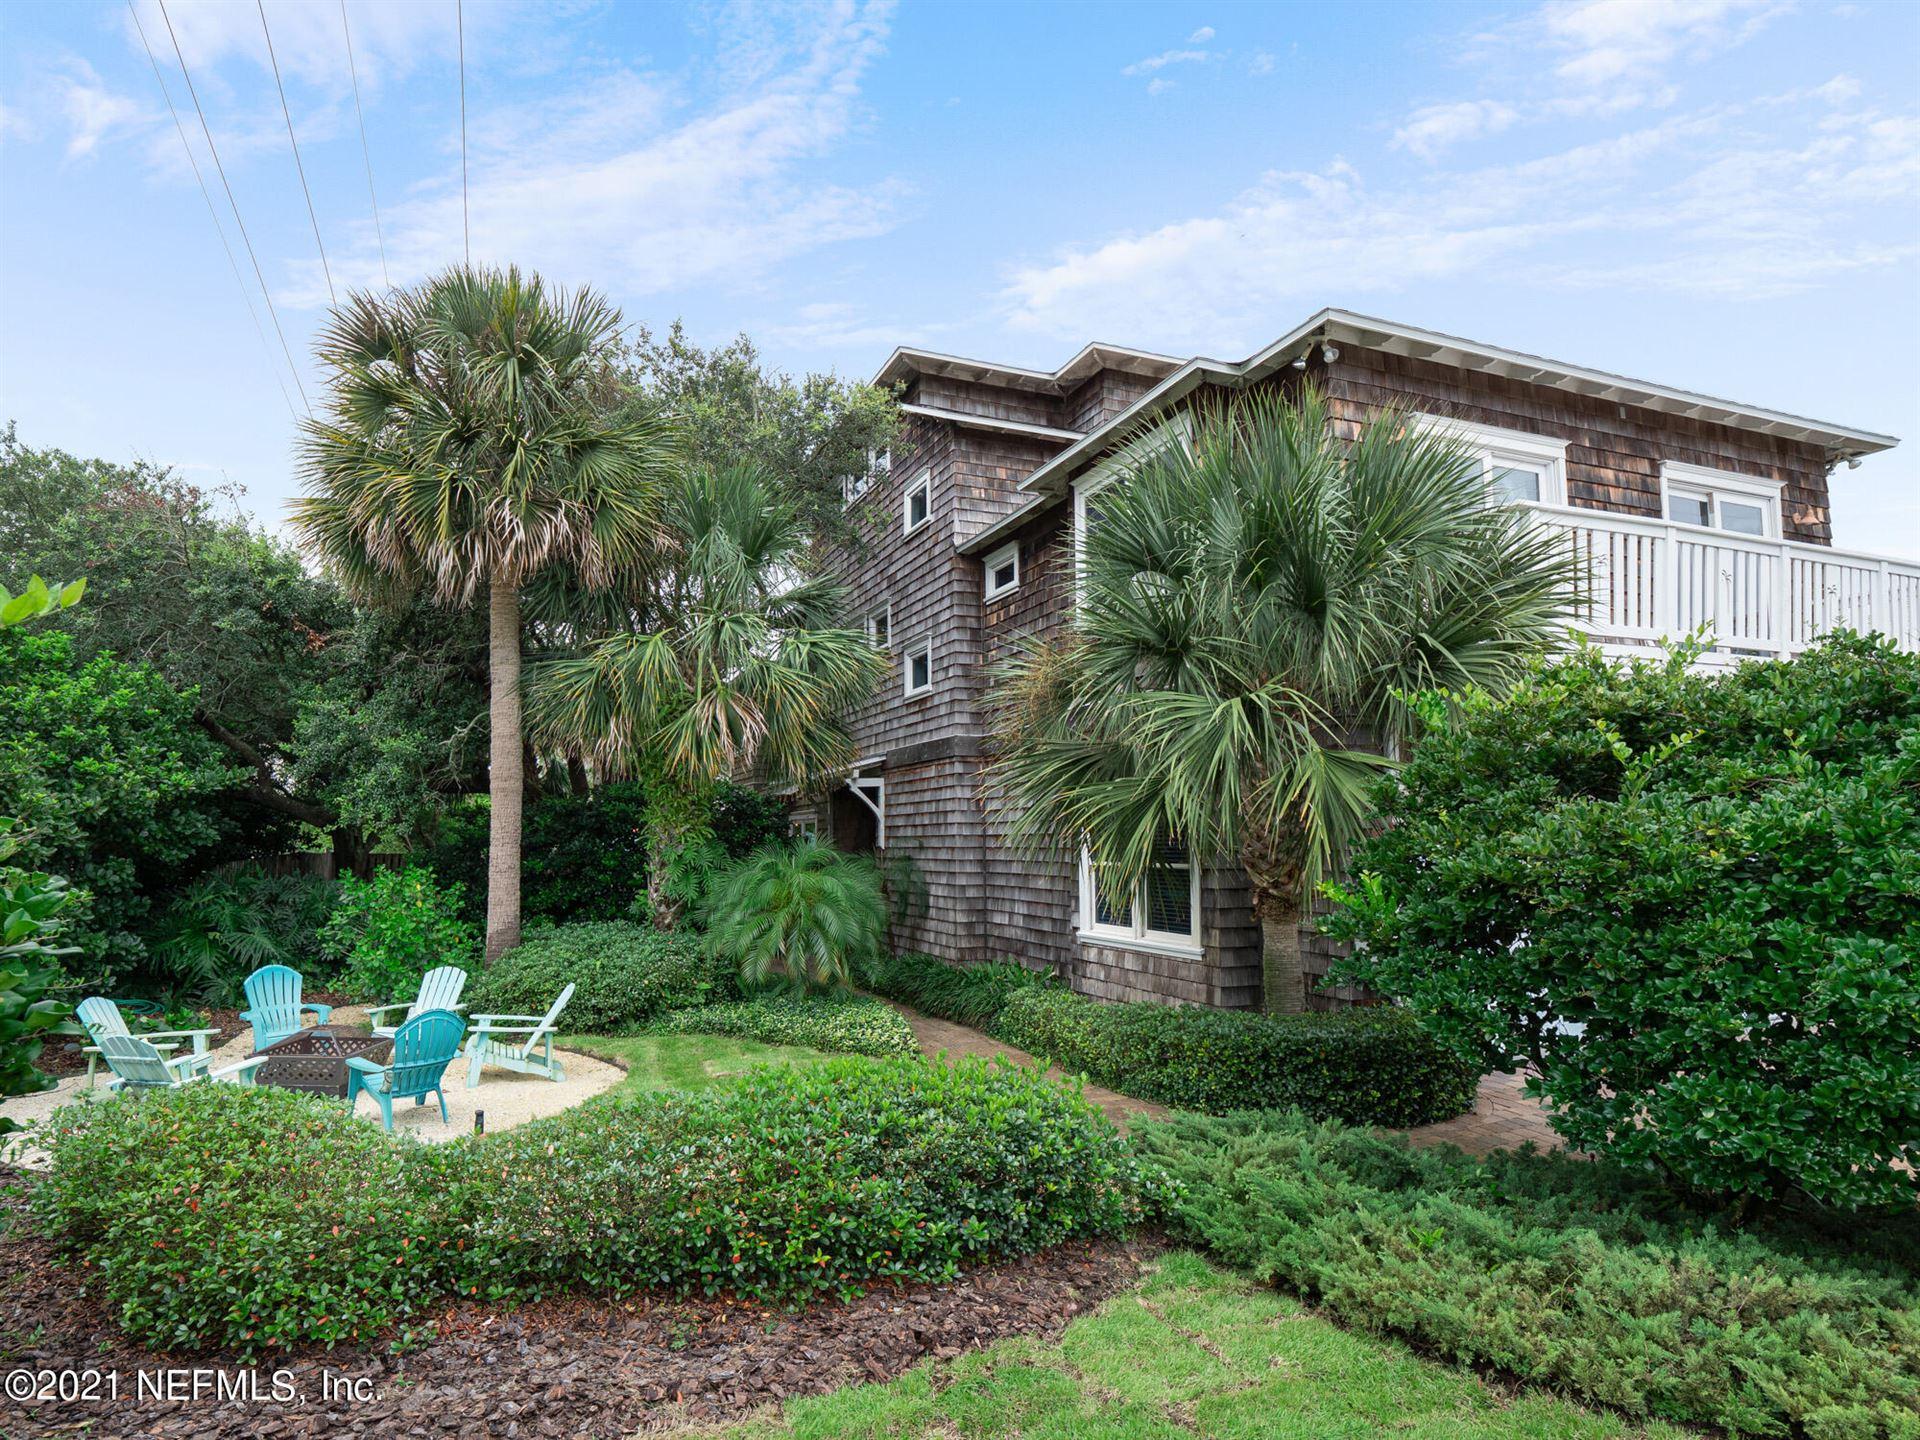 75 CORAL ST, Atlantic Beach, FL 32233 - MLS#: 1122302